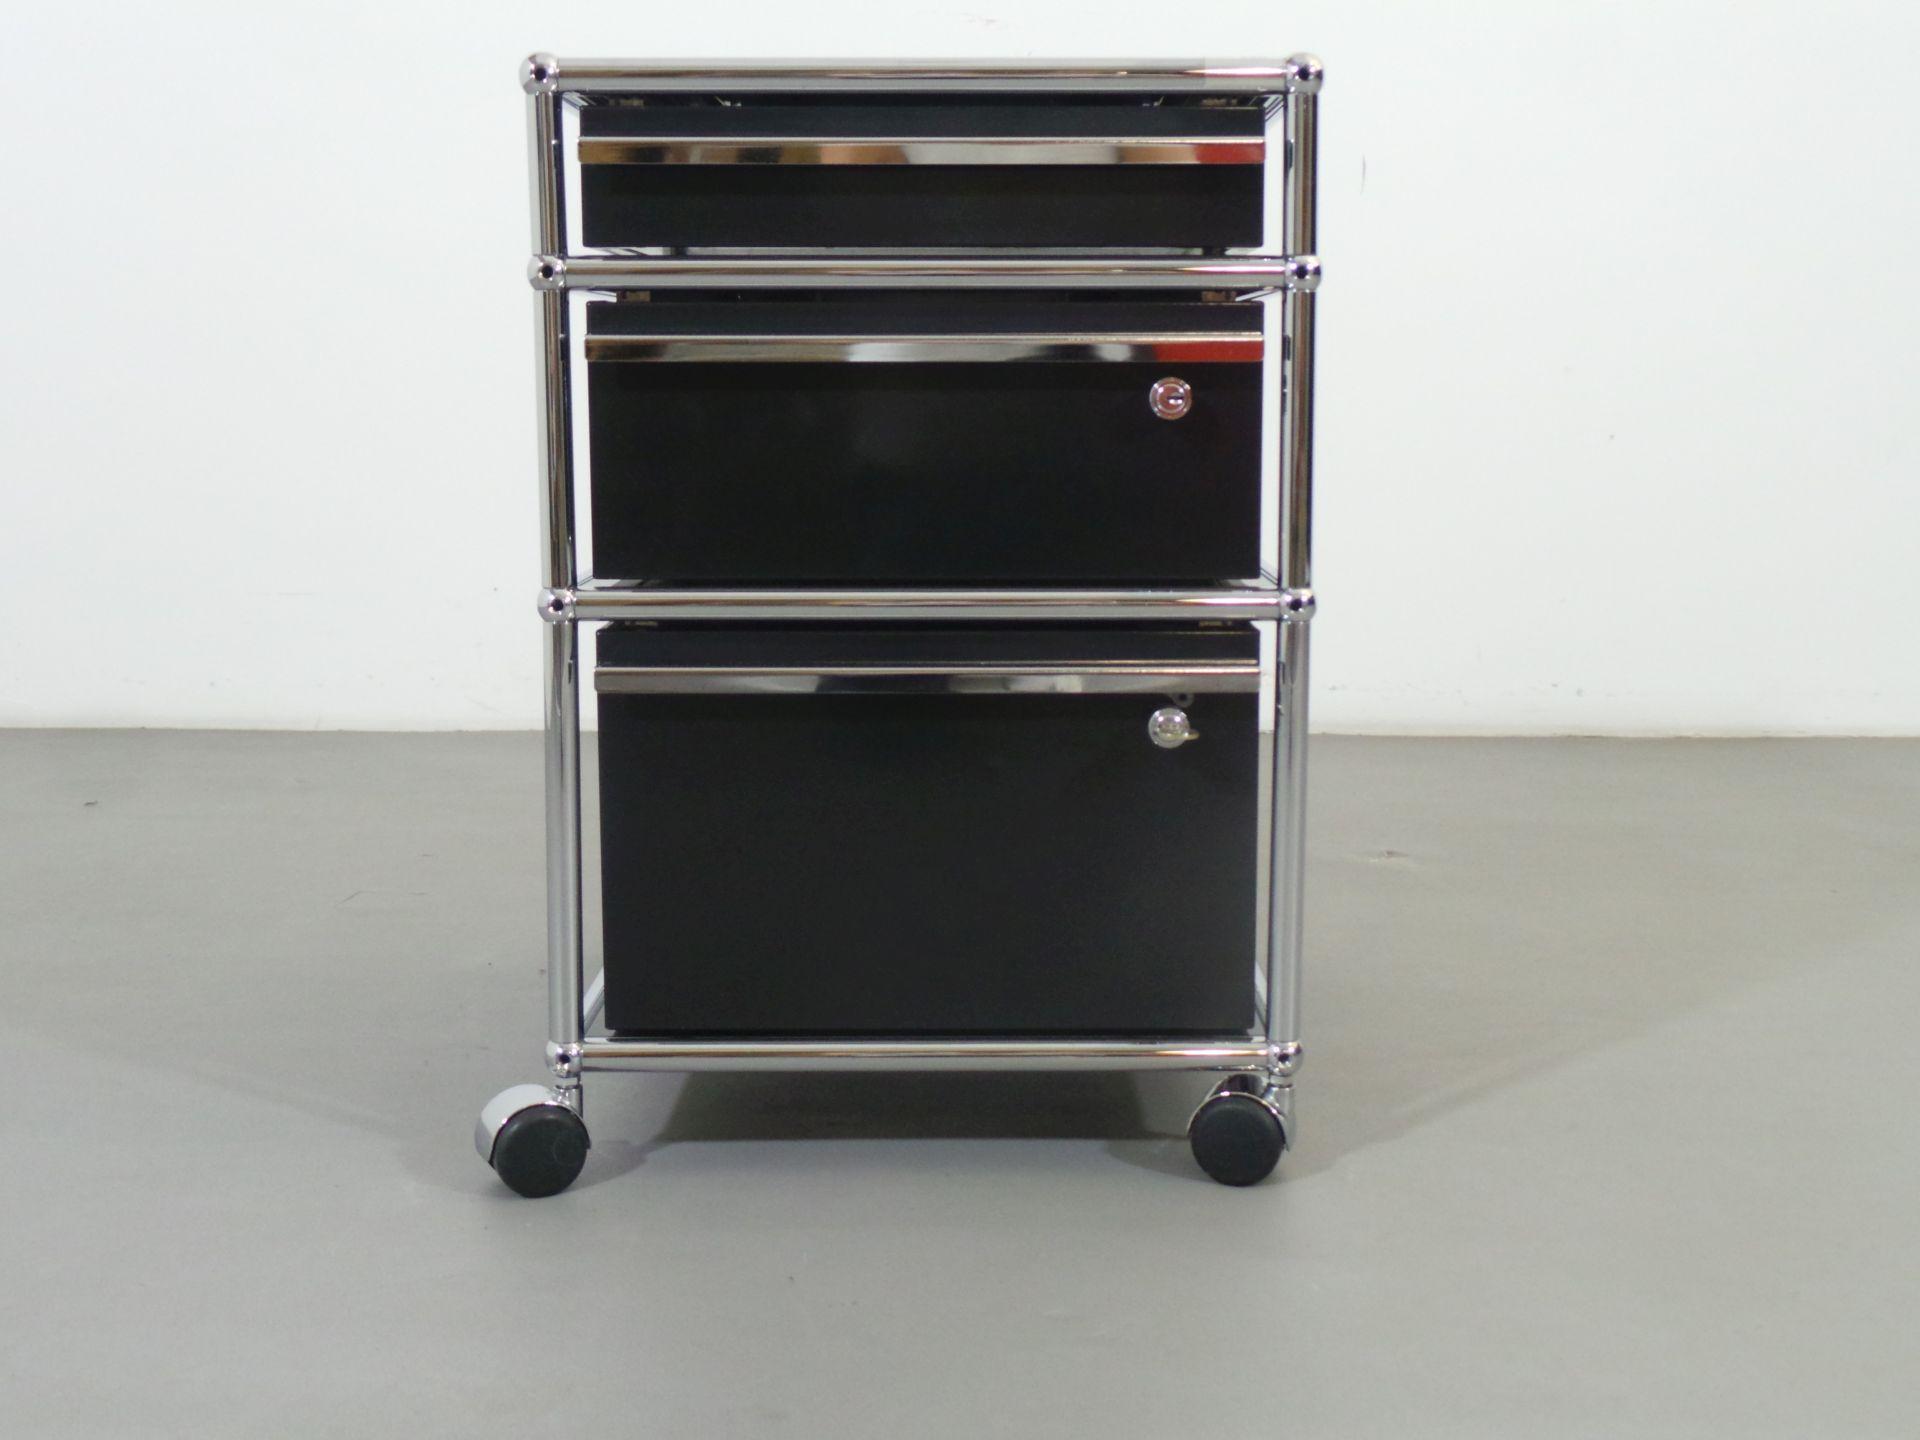 Usm haller rollcontainer schwarz 3 x auszug h ngeregister 2 x schloss arttolive by ralph - Usm haller rollcontainer ...